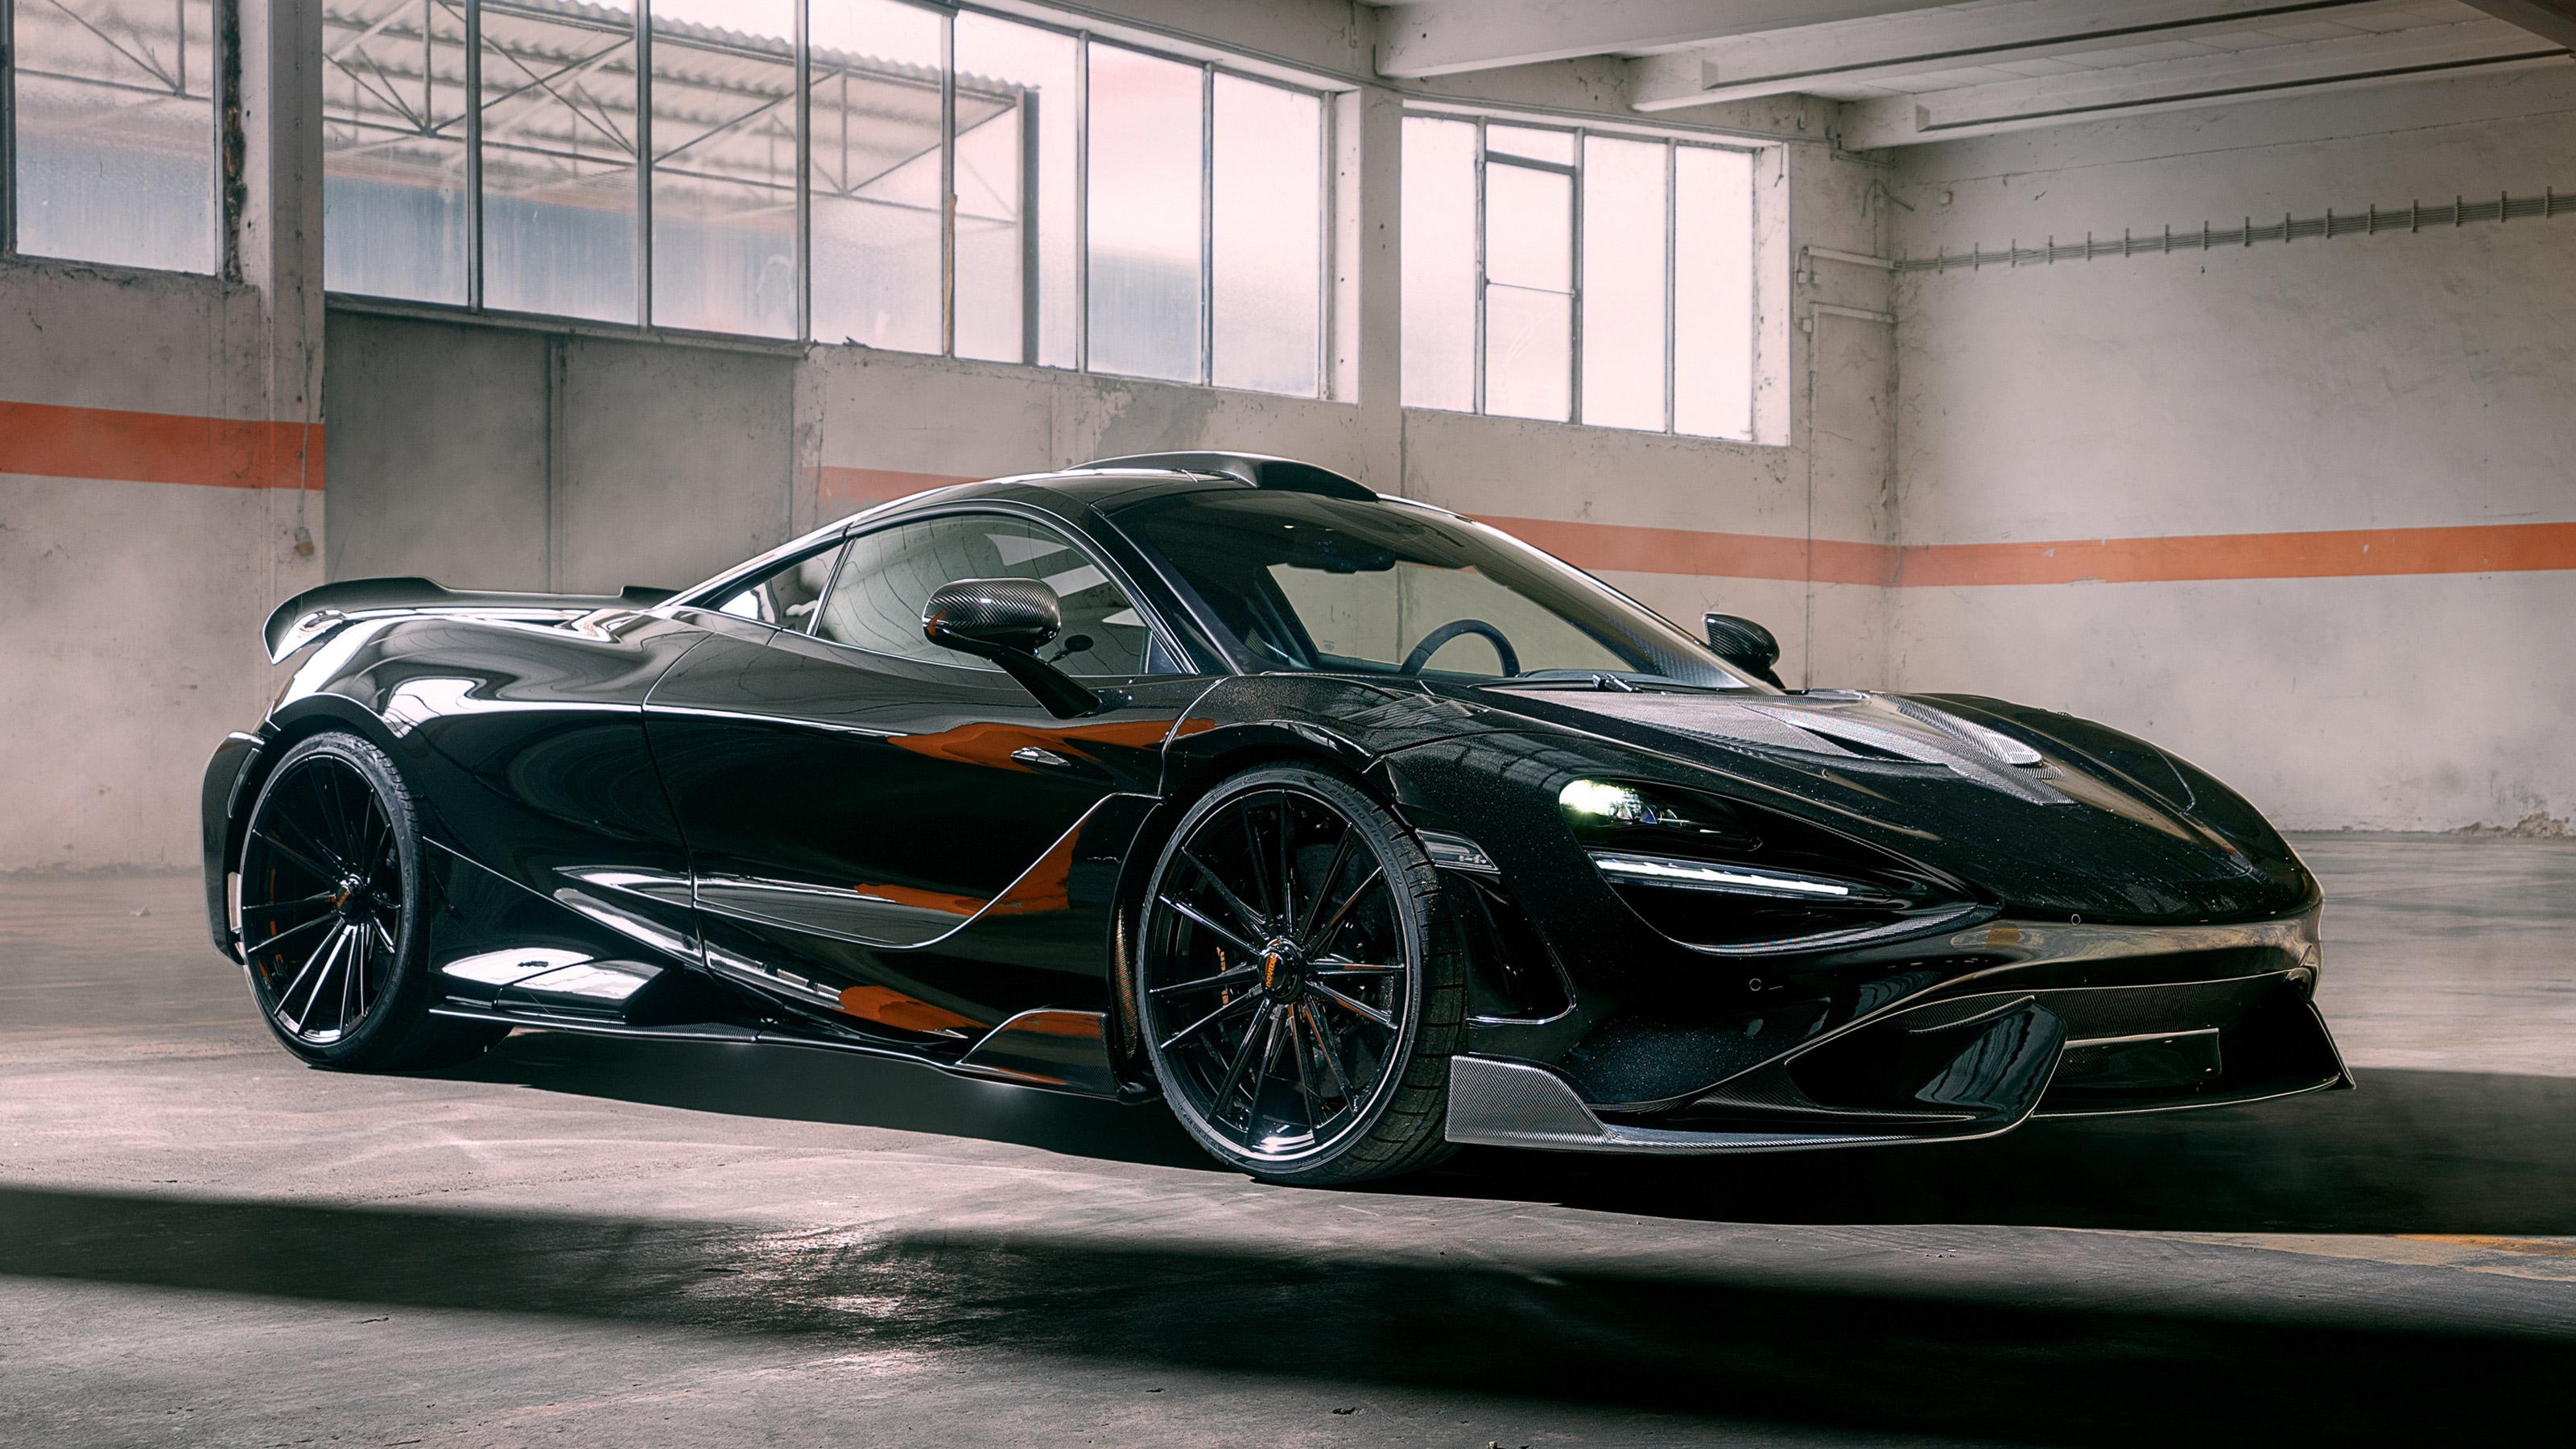 Novitec-tuned McLaren 765LT has higher power-to-weight than P1